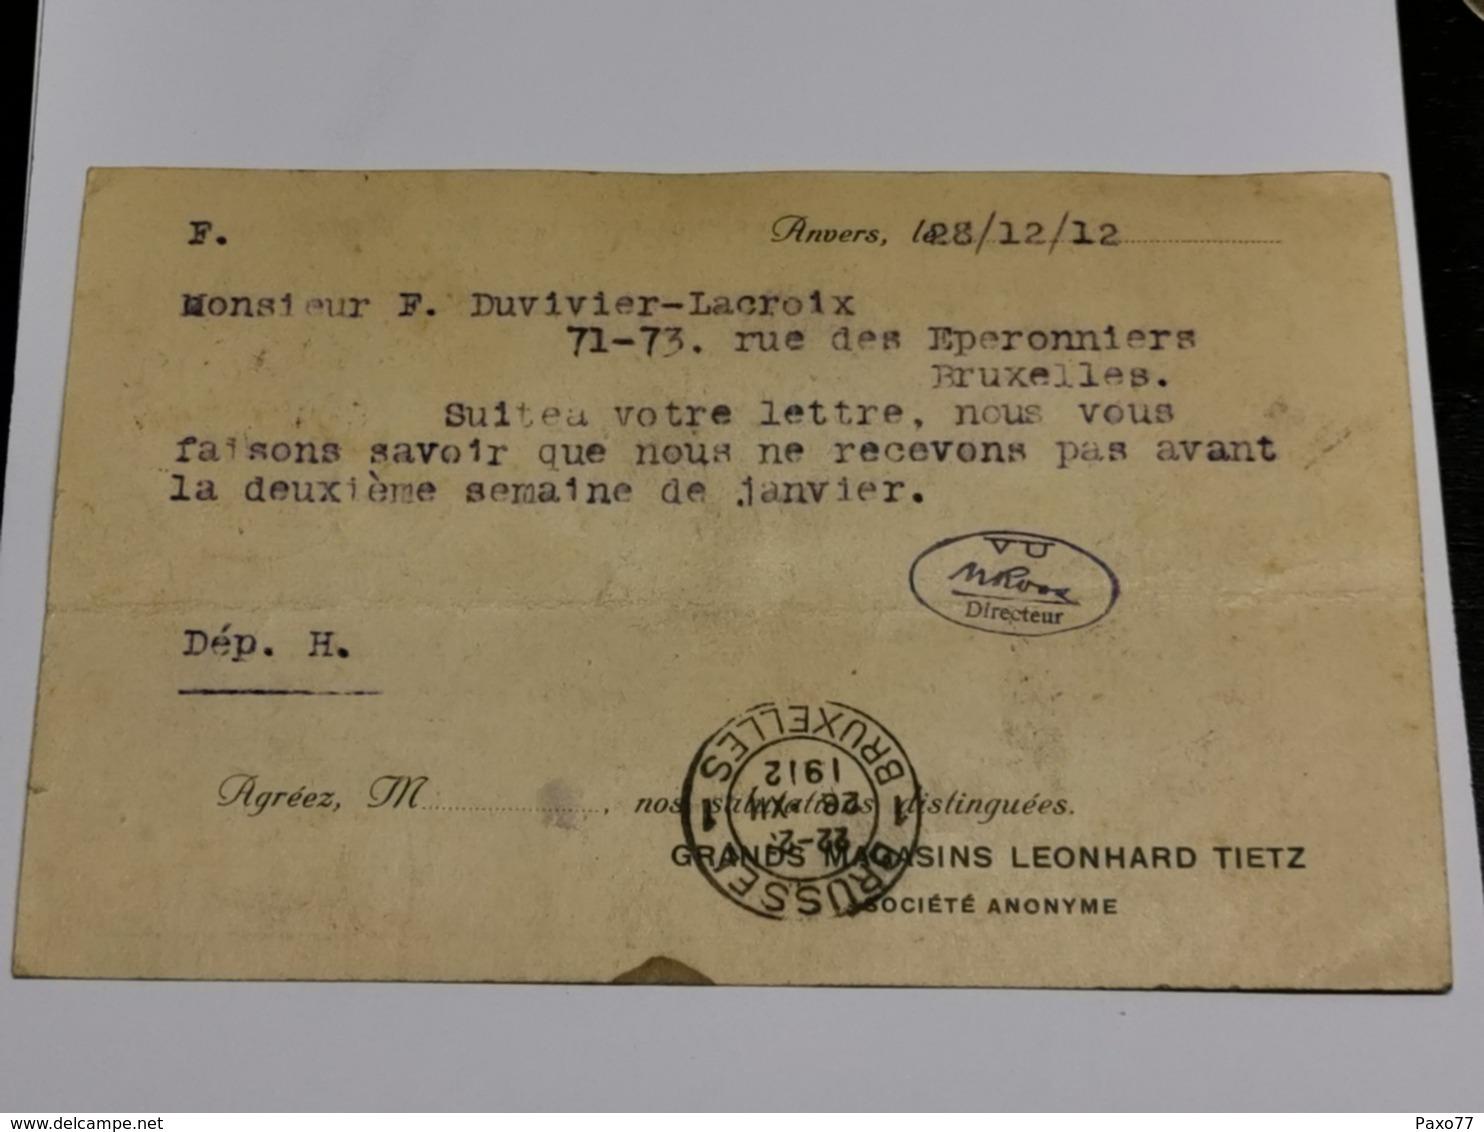 Grands Magasins Leonhard Tietz, Anvers 1912 - Antwerpen